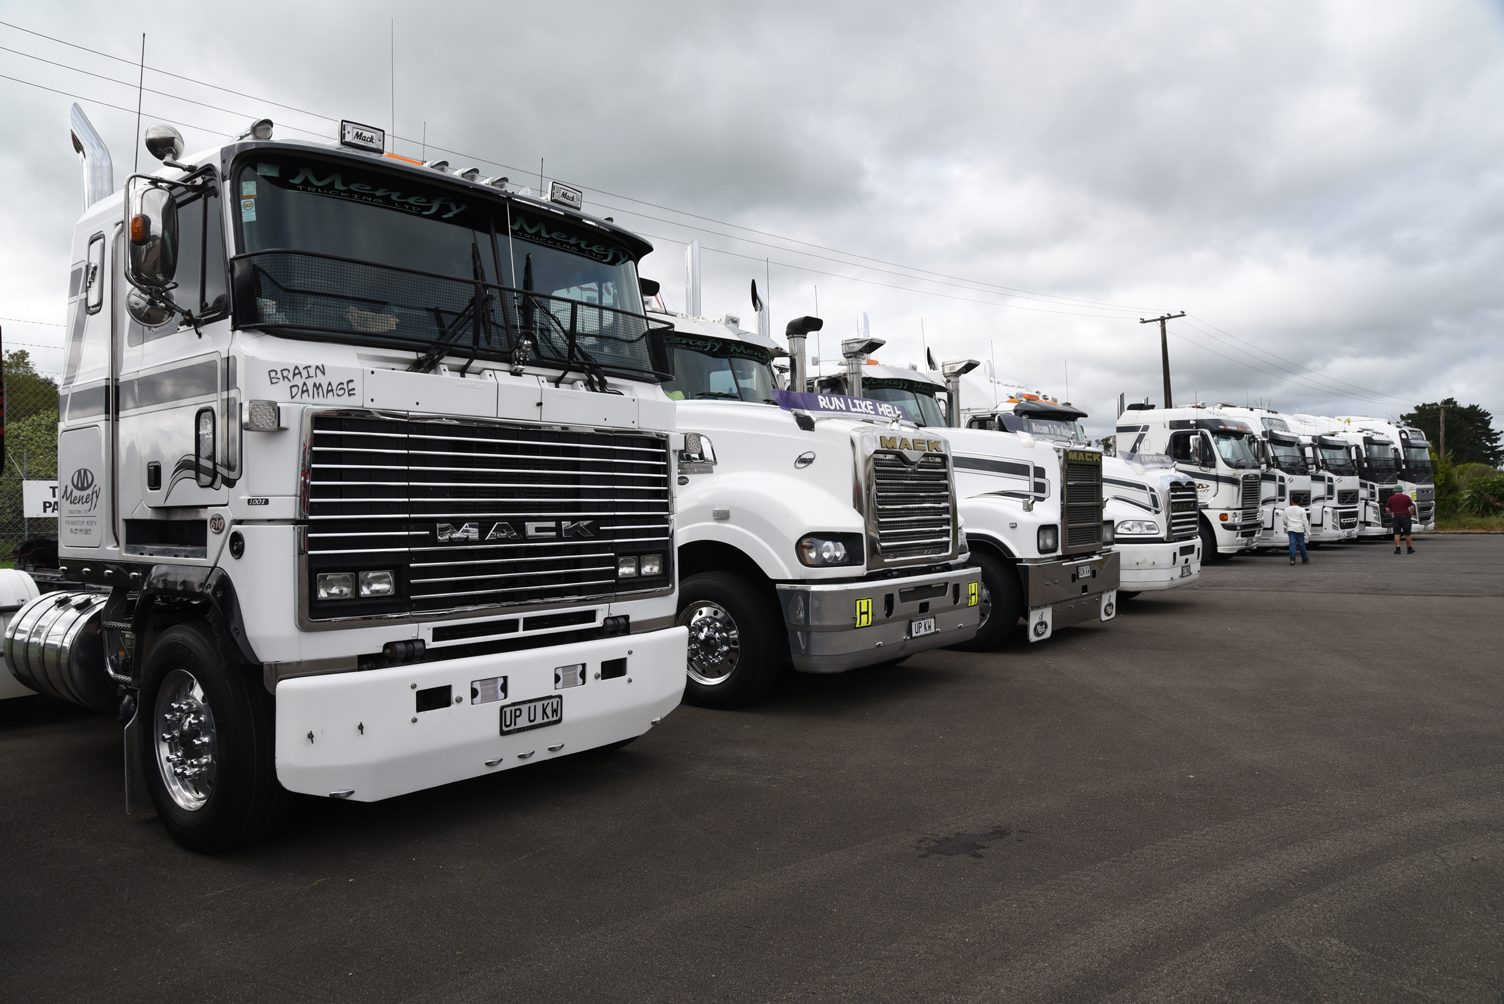 A row of Menefy Transport trucks that took home the fleet award